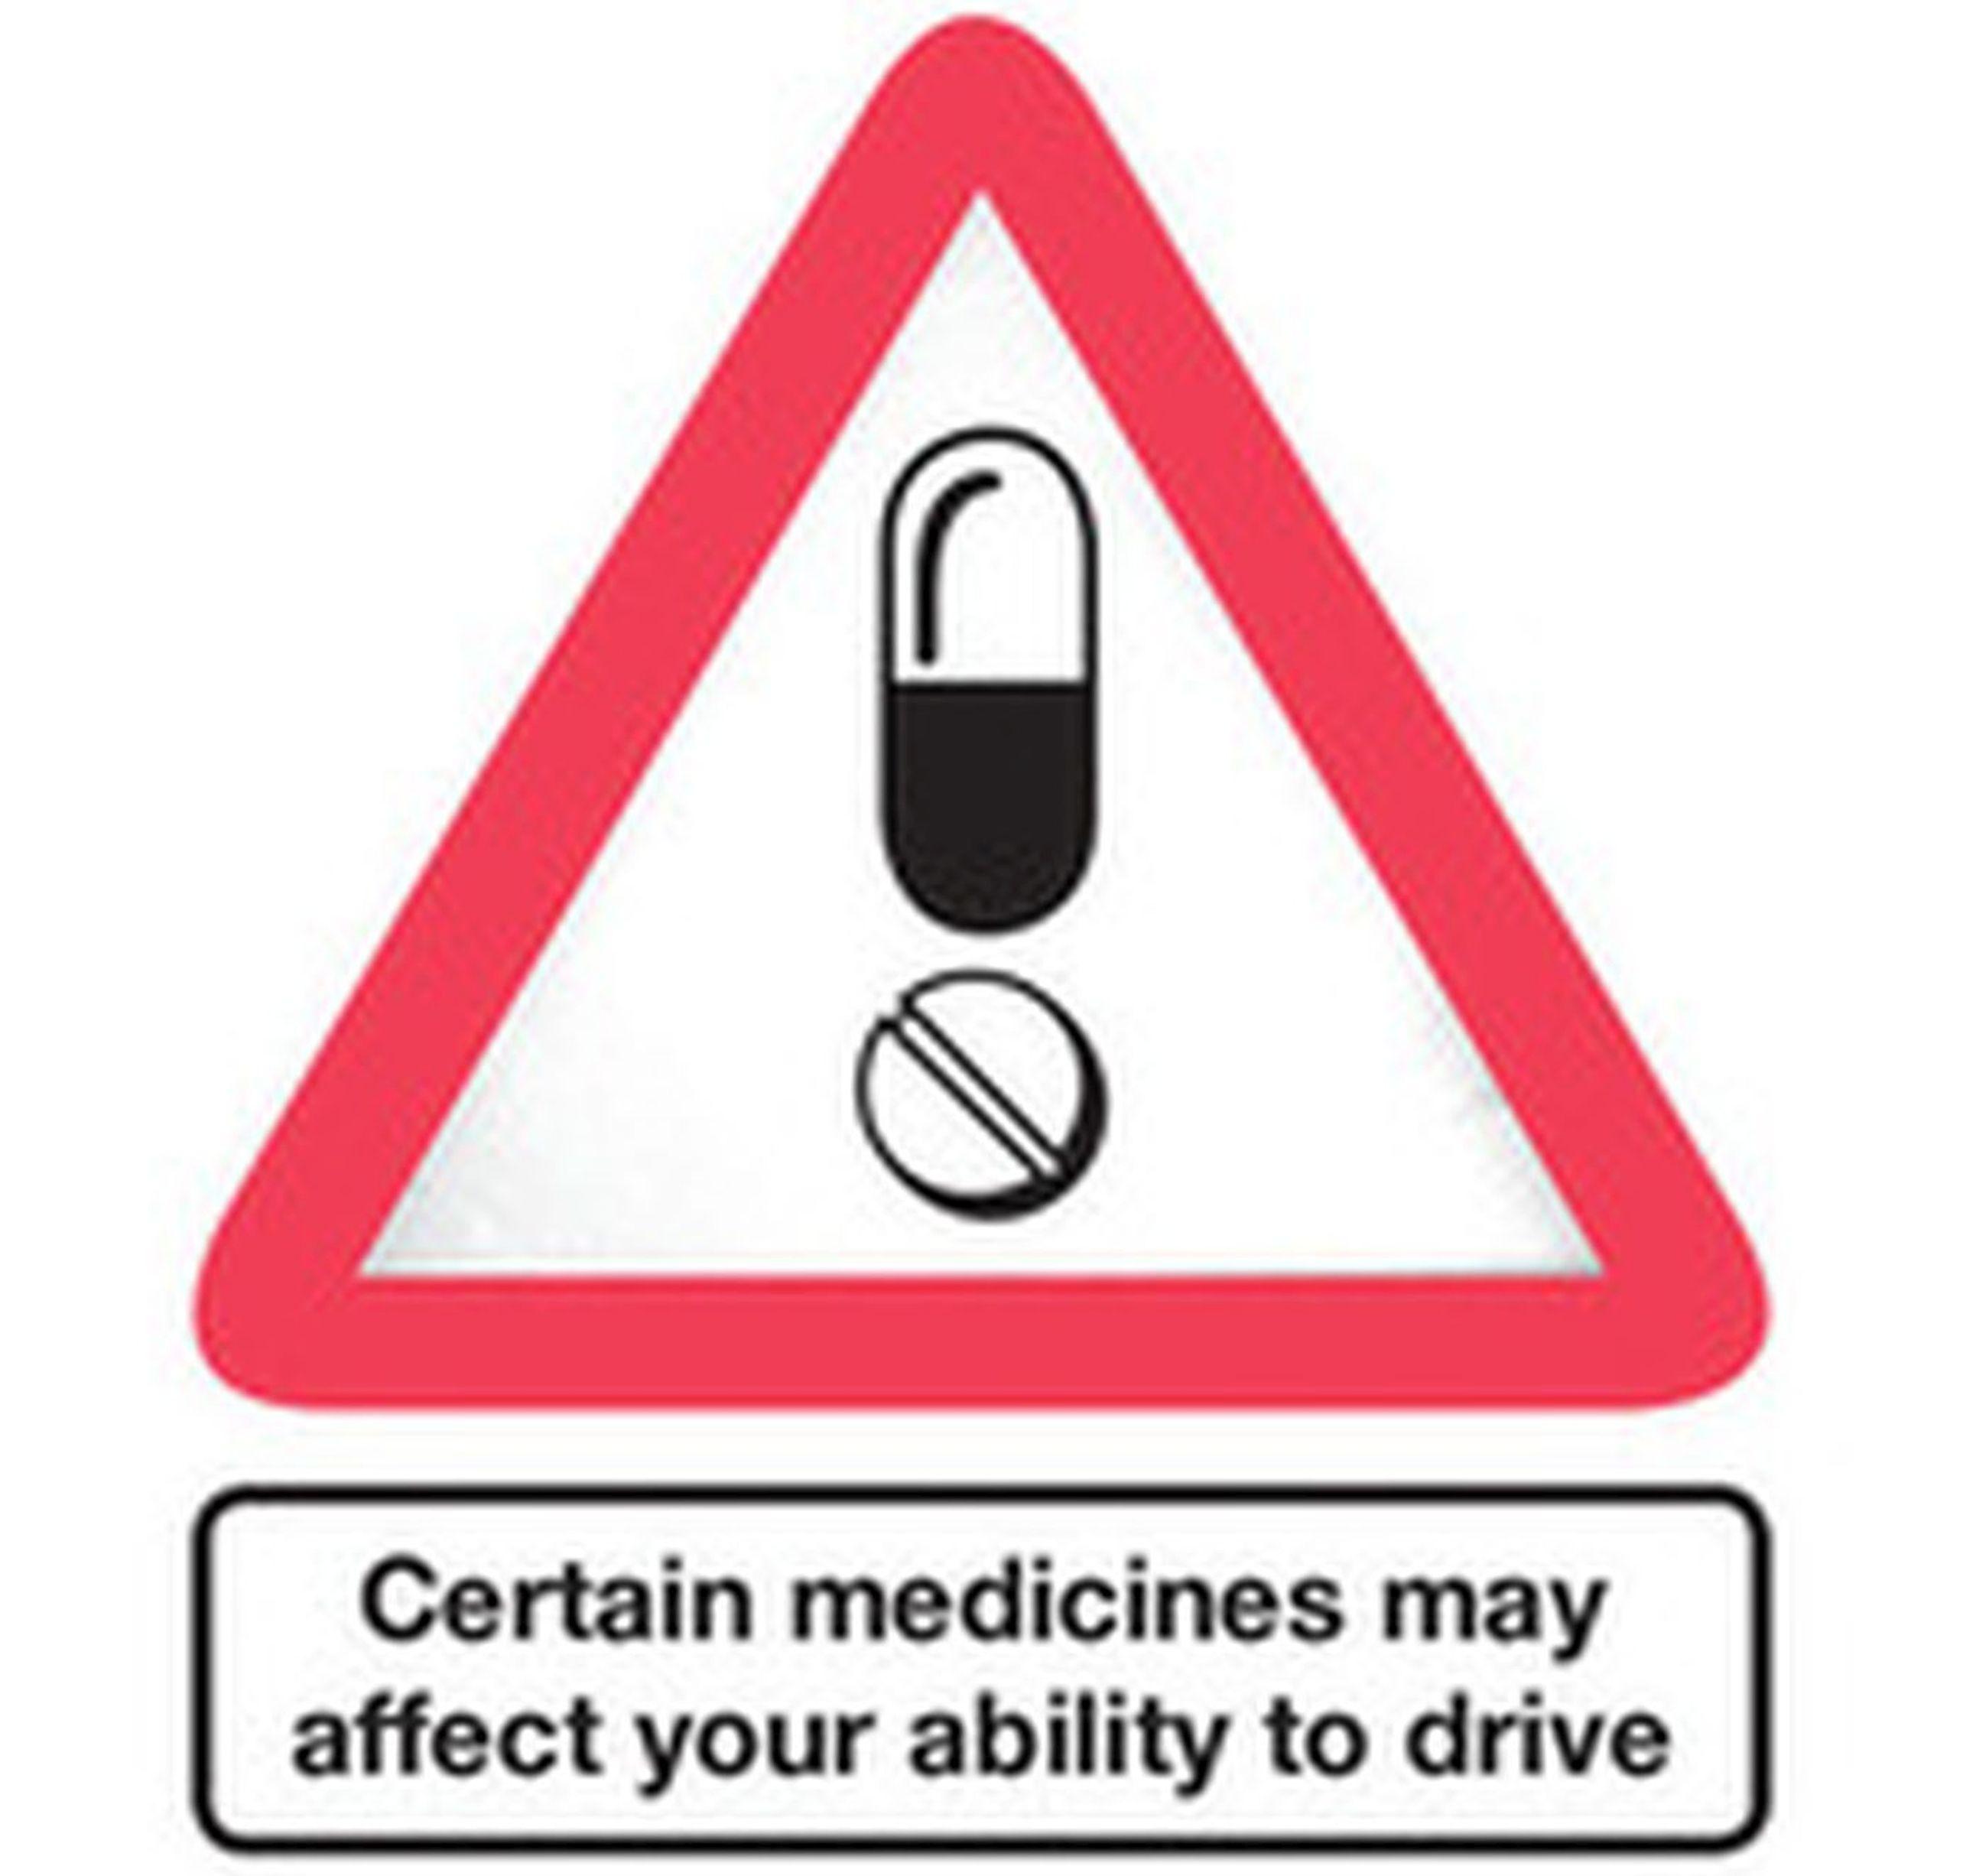 Prednisolone Warning